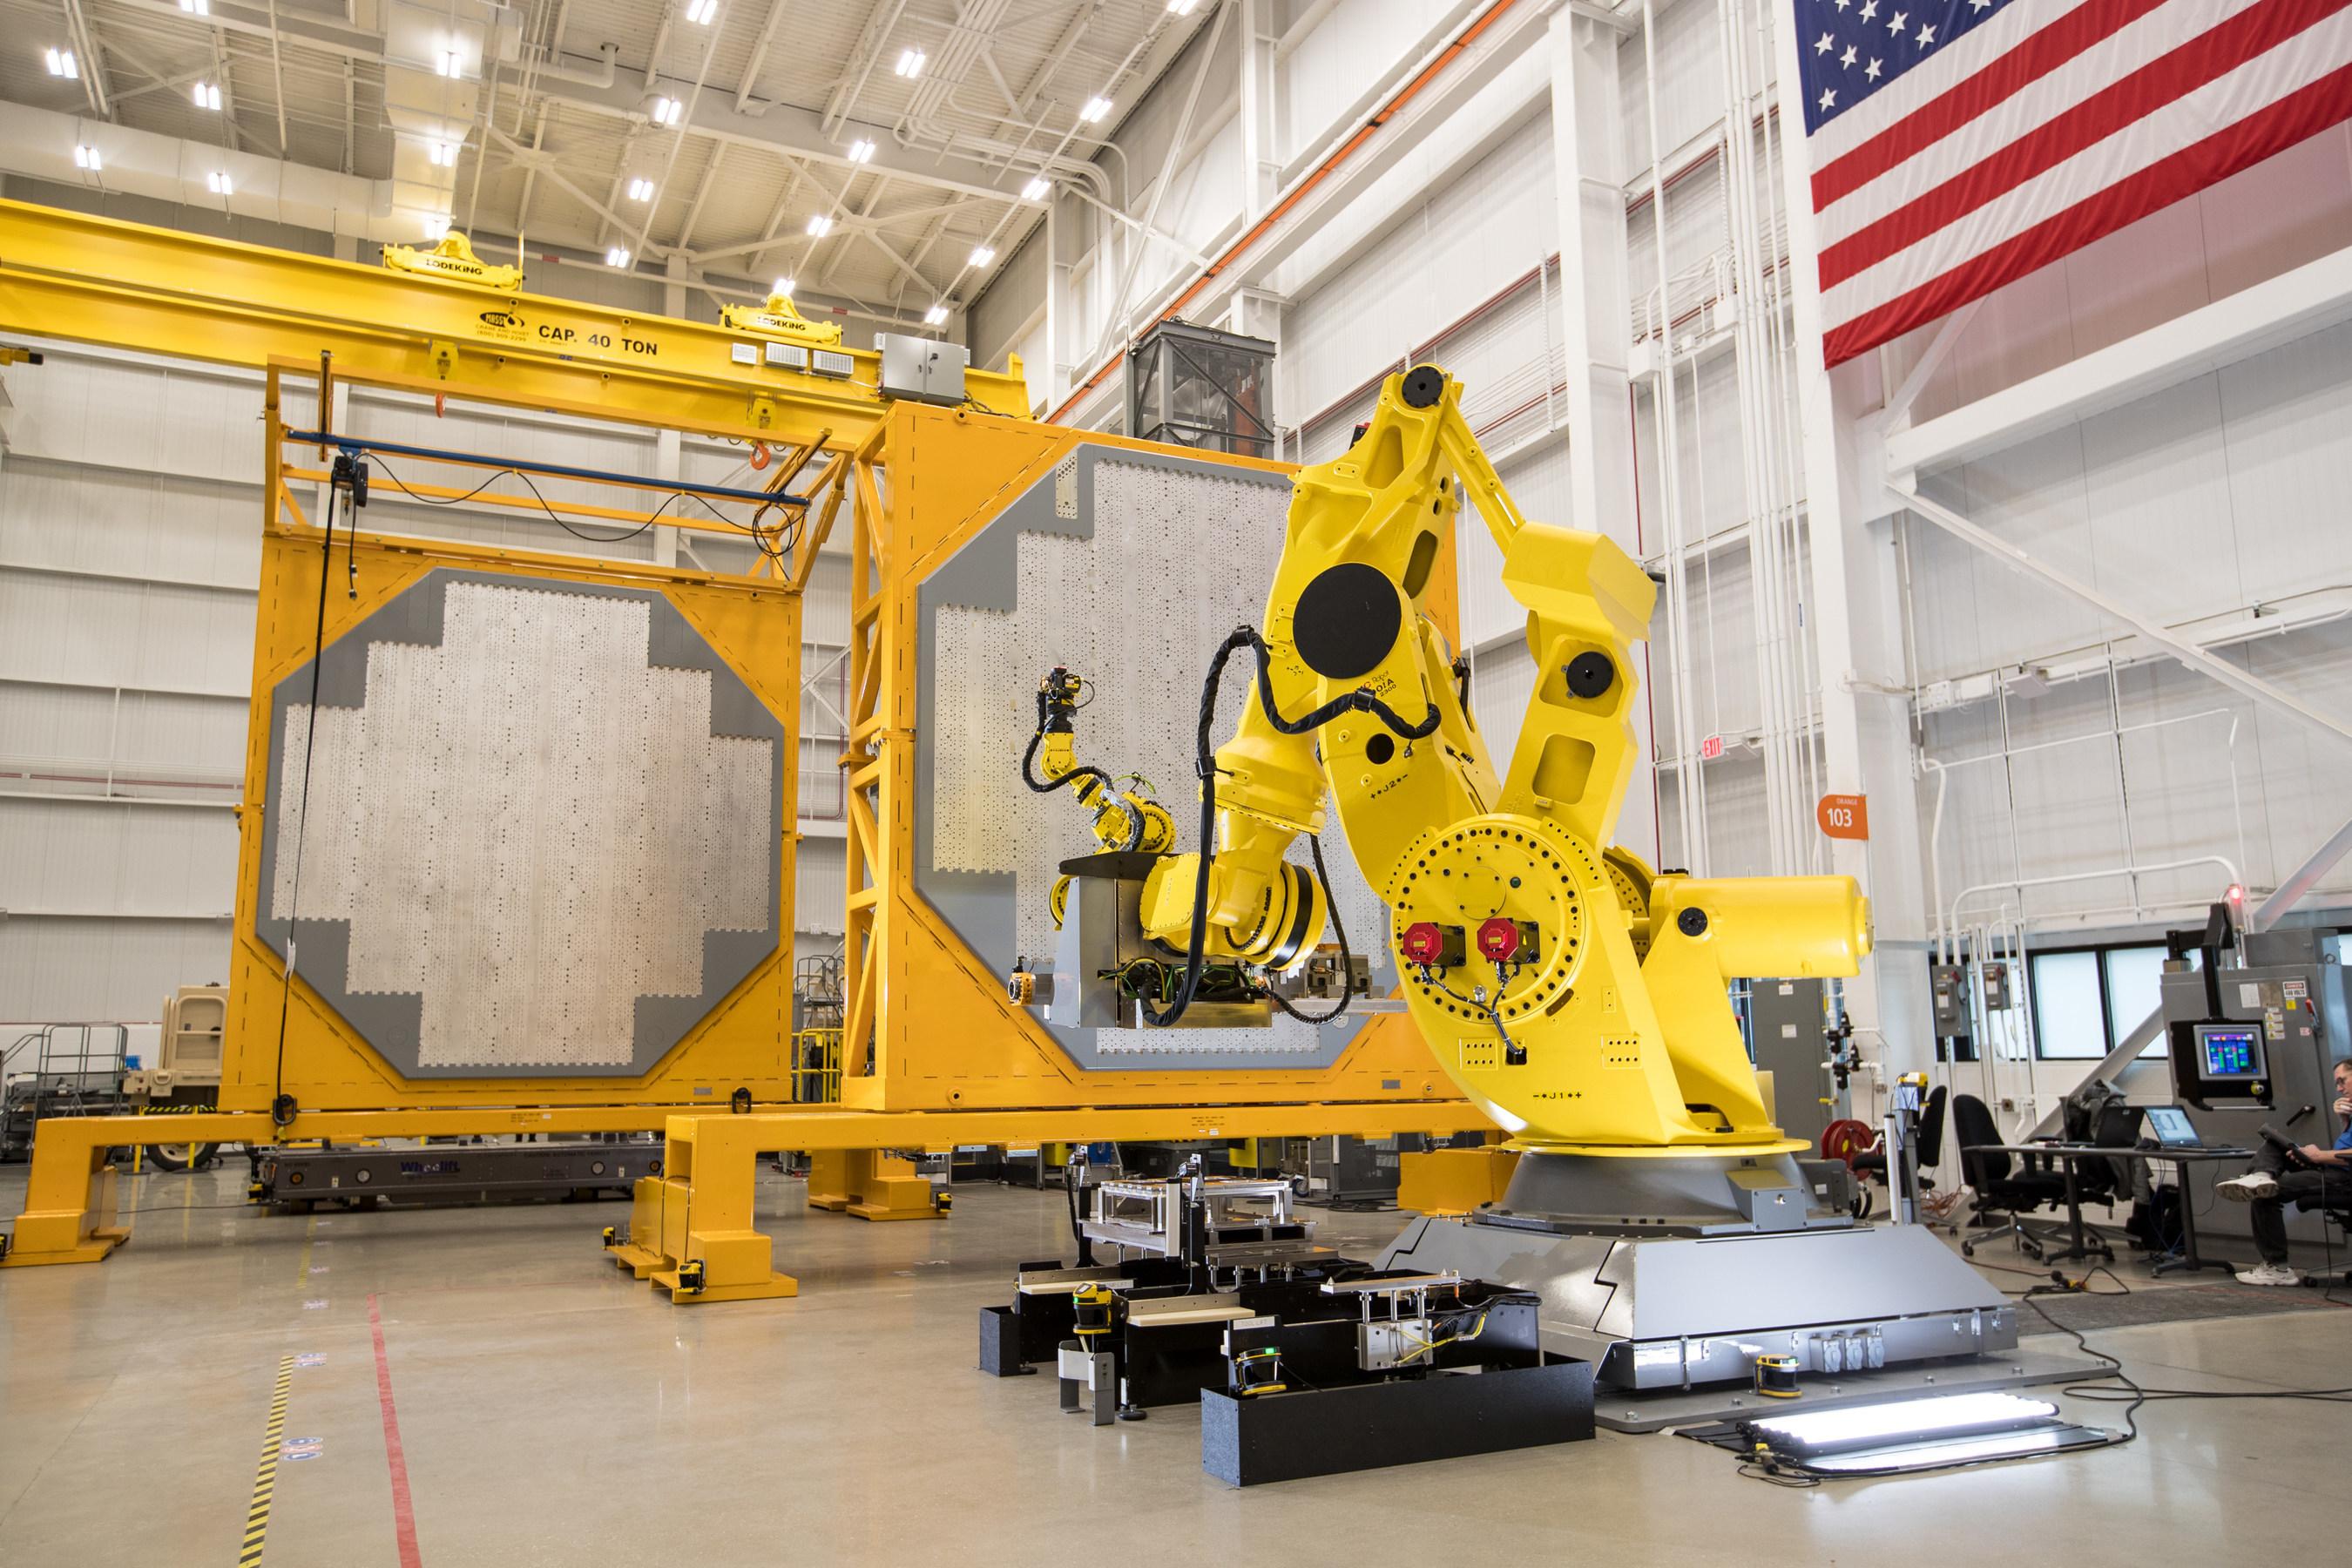 The U.S. Navy's AN/SPY-6(V)1 radar is being built in Raytheon's Andover, MA based radar development facility.